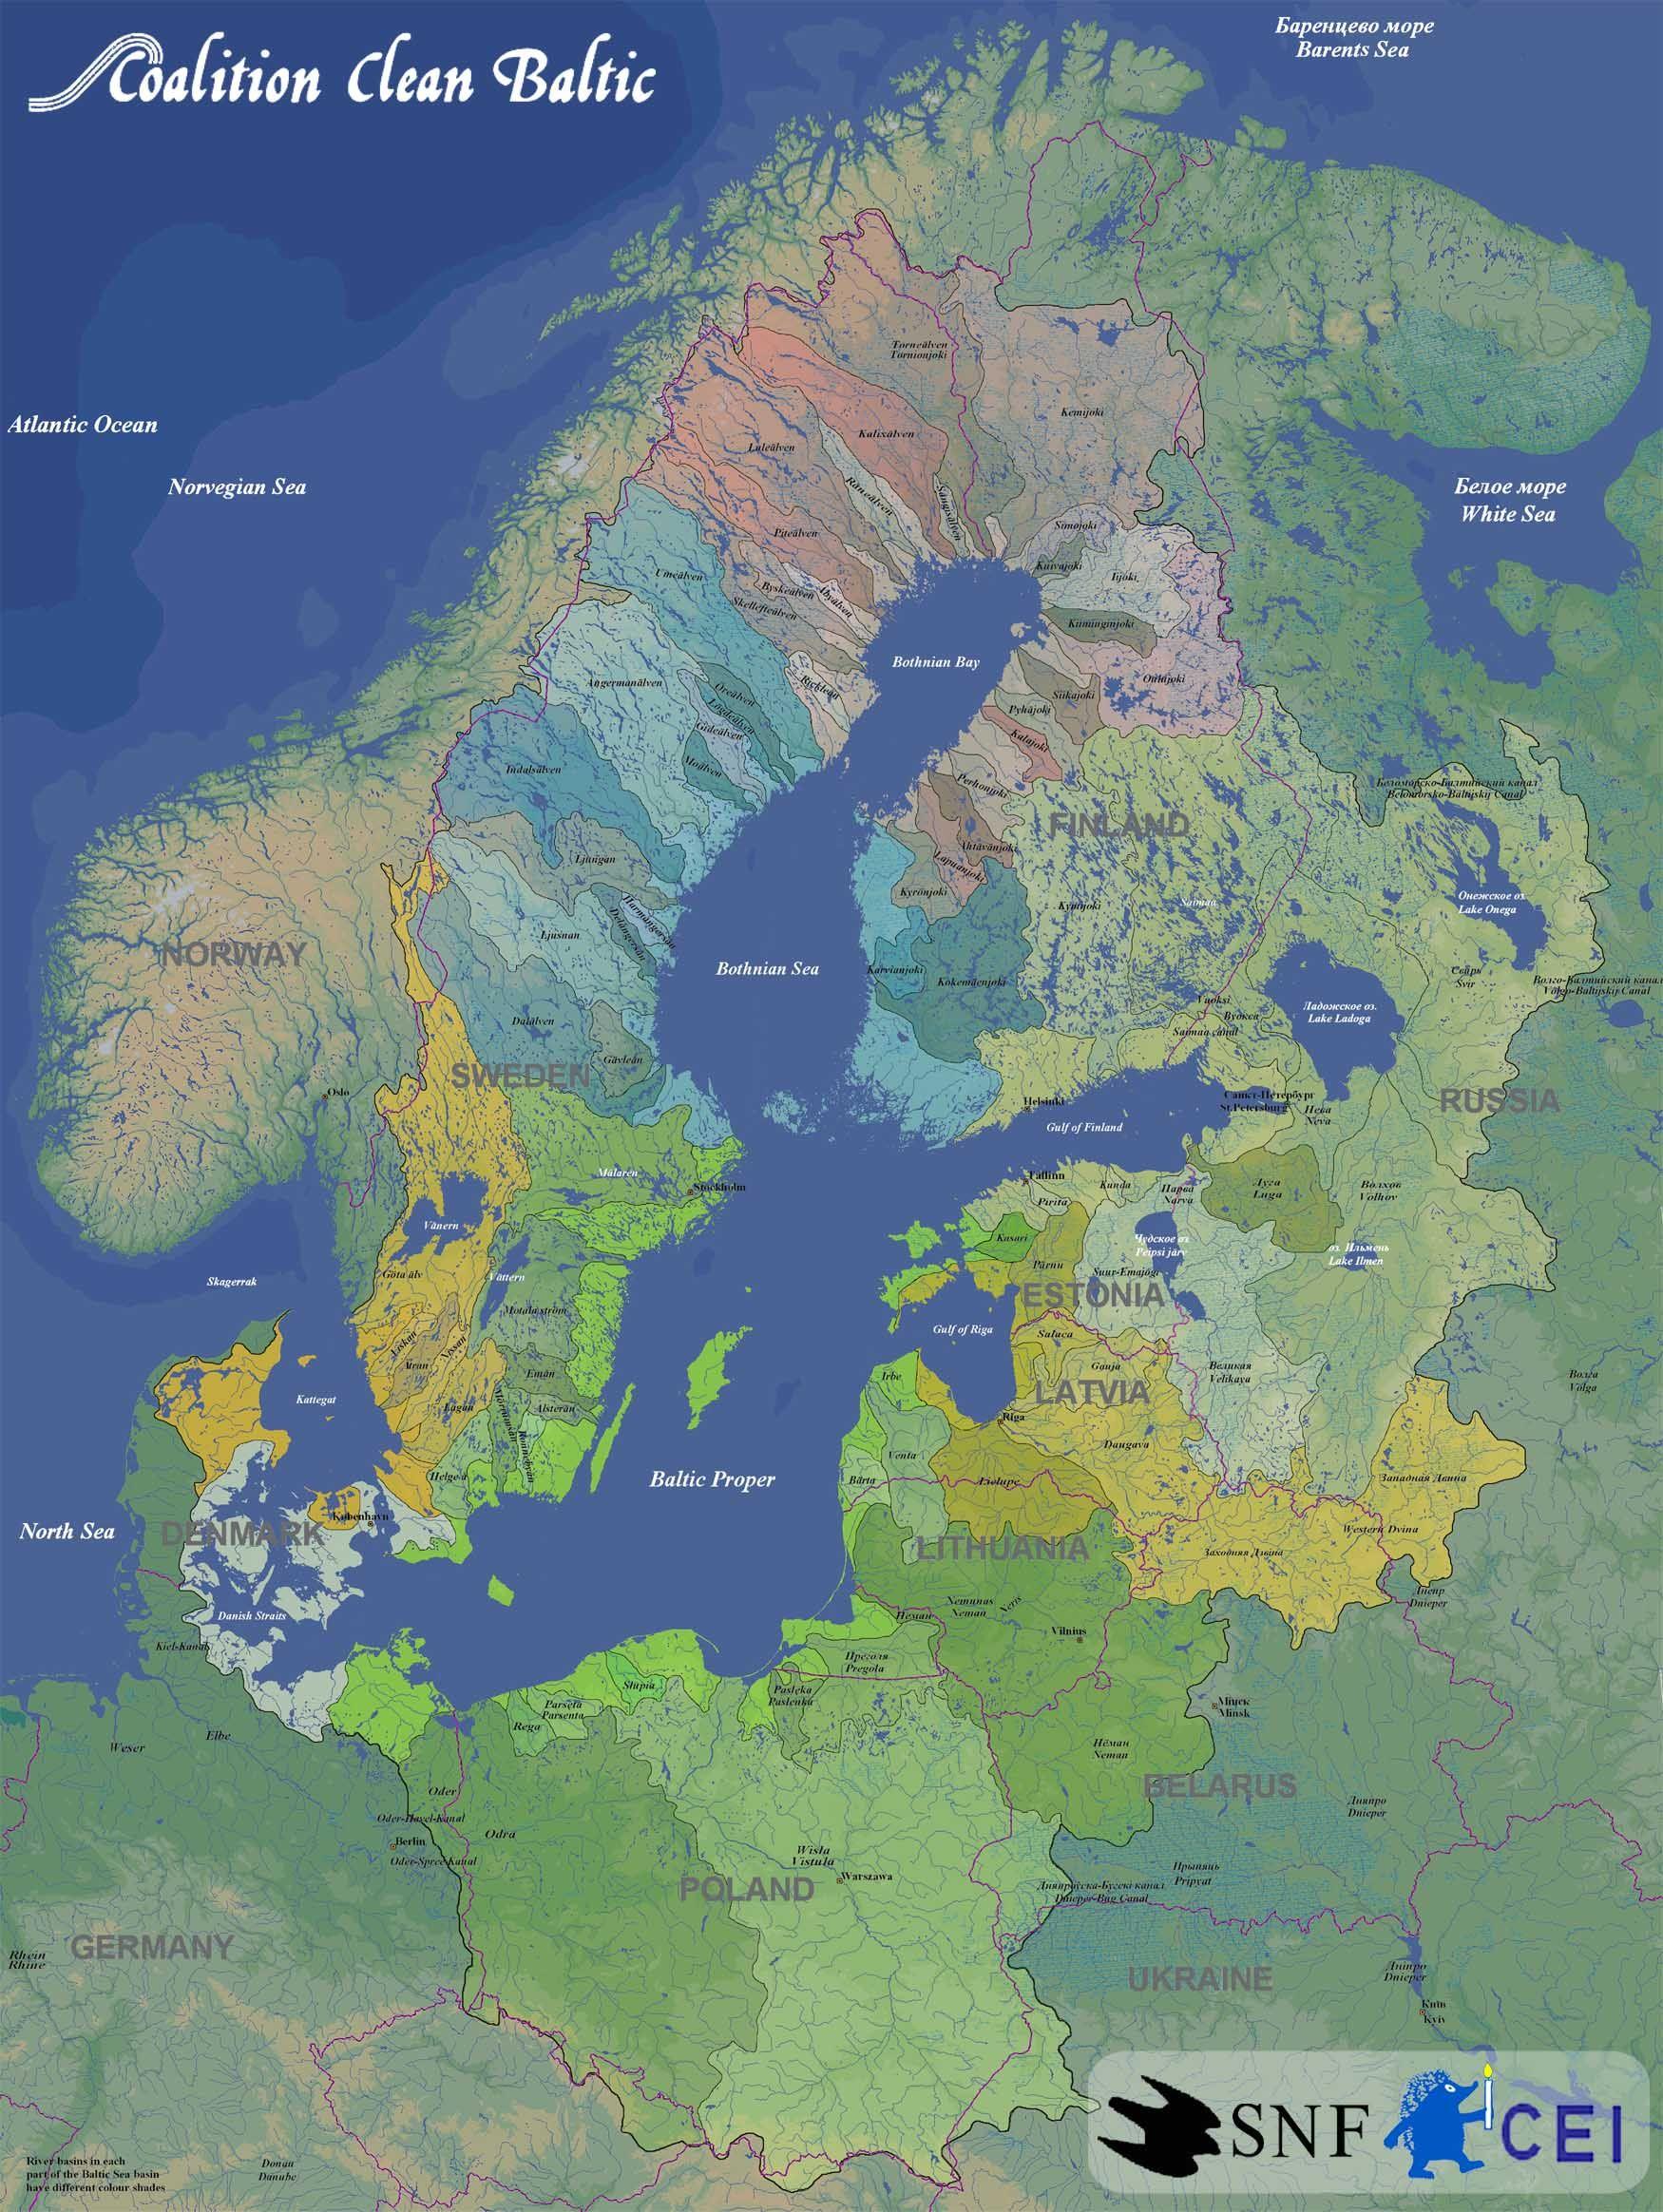 Baltic Sea River Basins Map Baltic Sea Mappery Map Fantasy